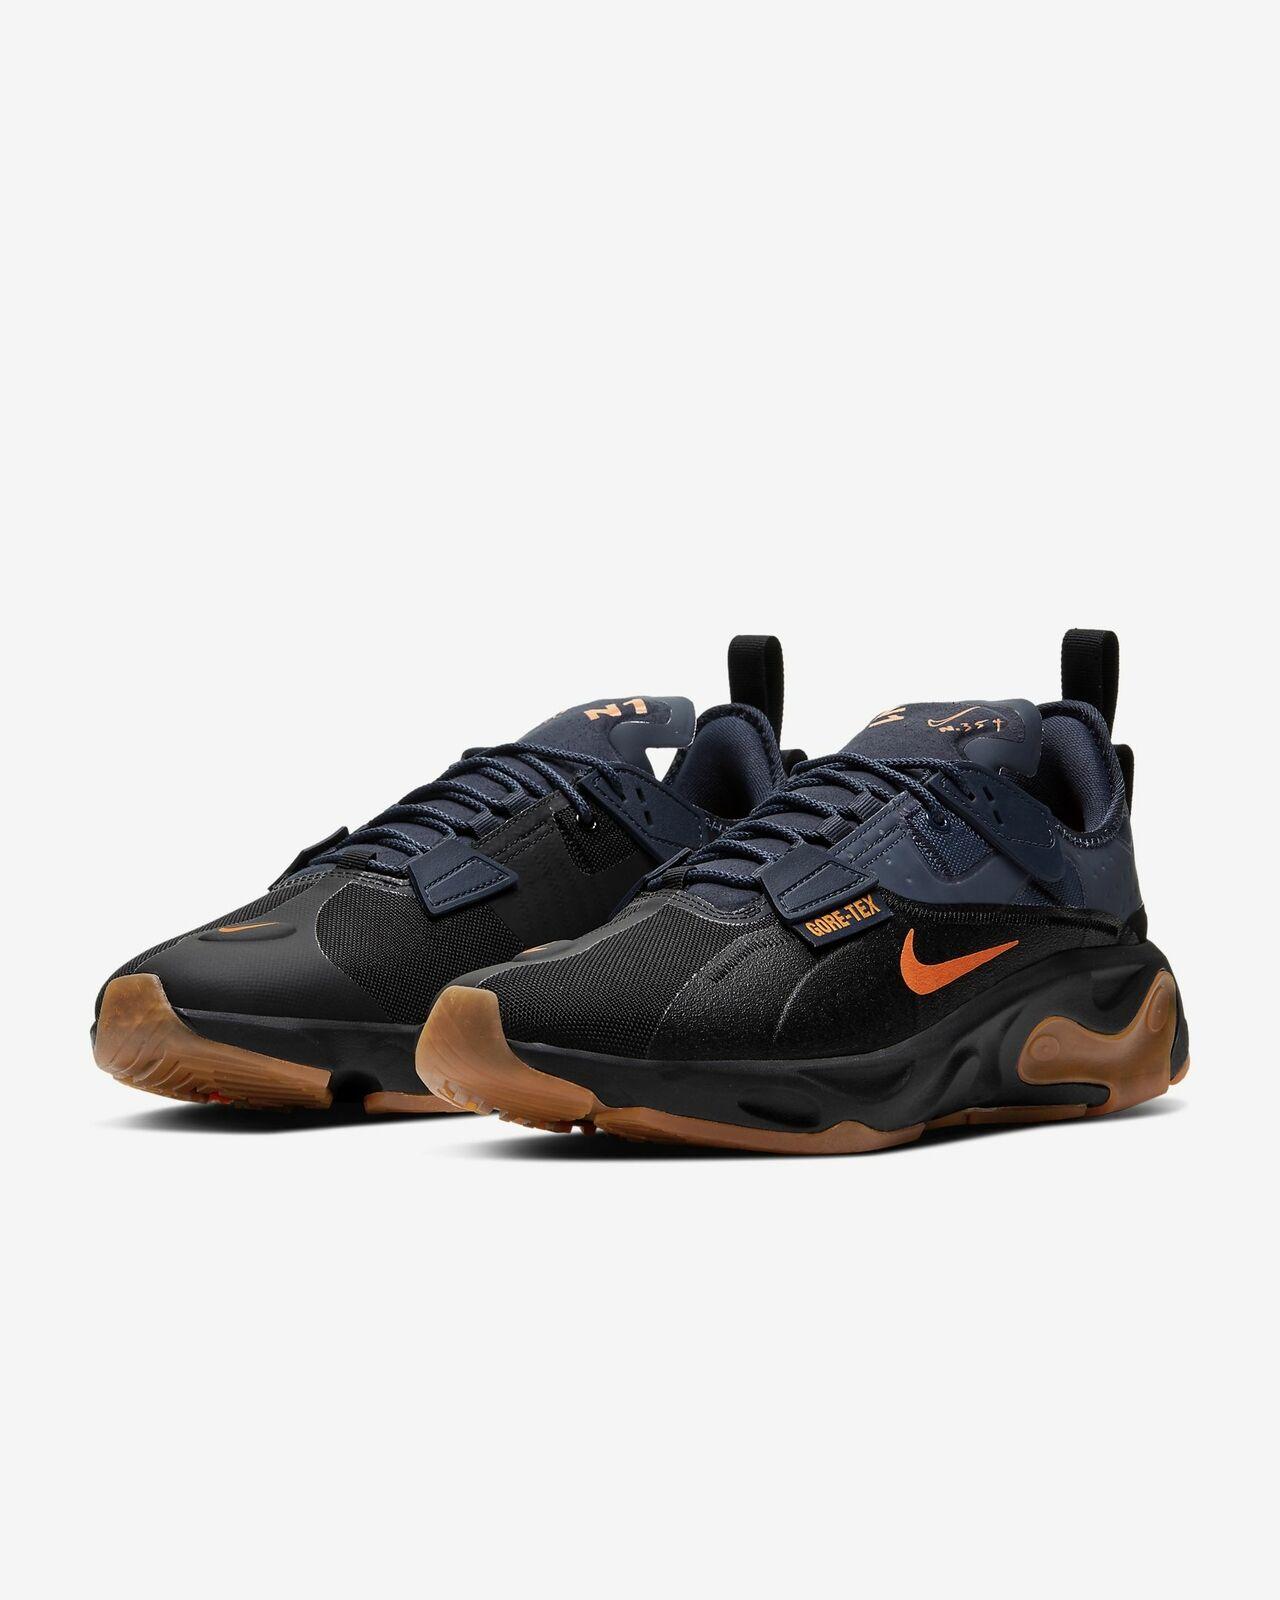 Nike React Type GTX Gore-Tex Black Bright Ceramic BQ4737-001